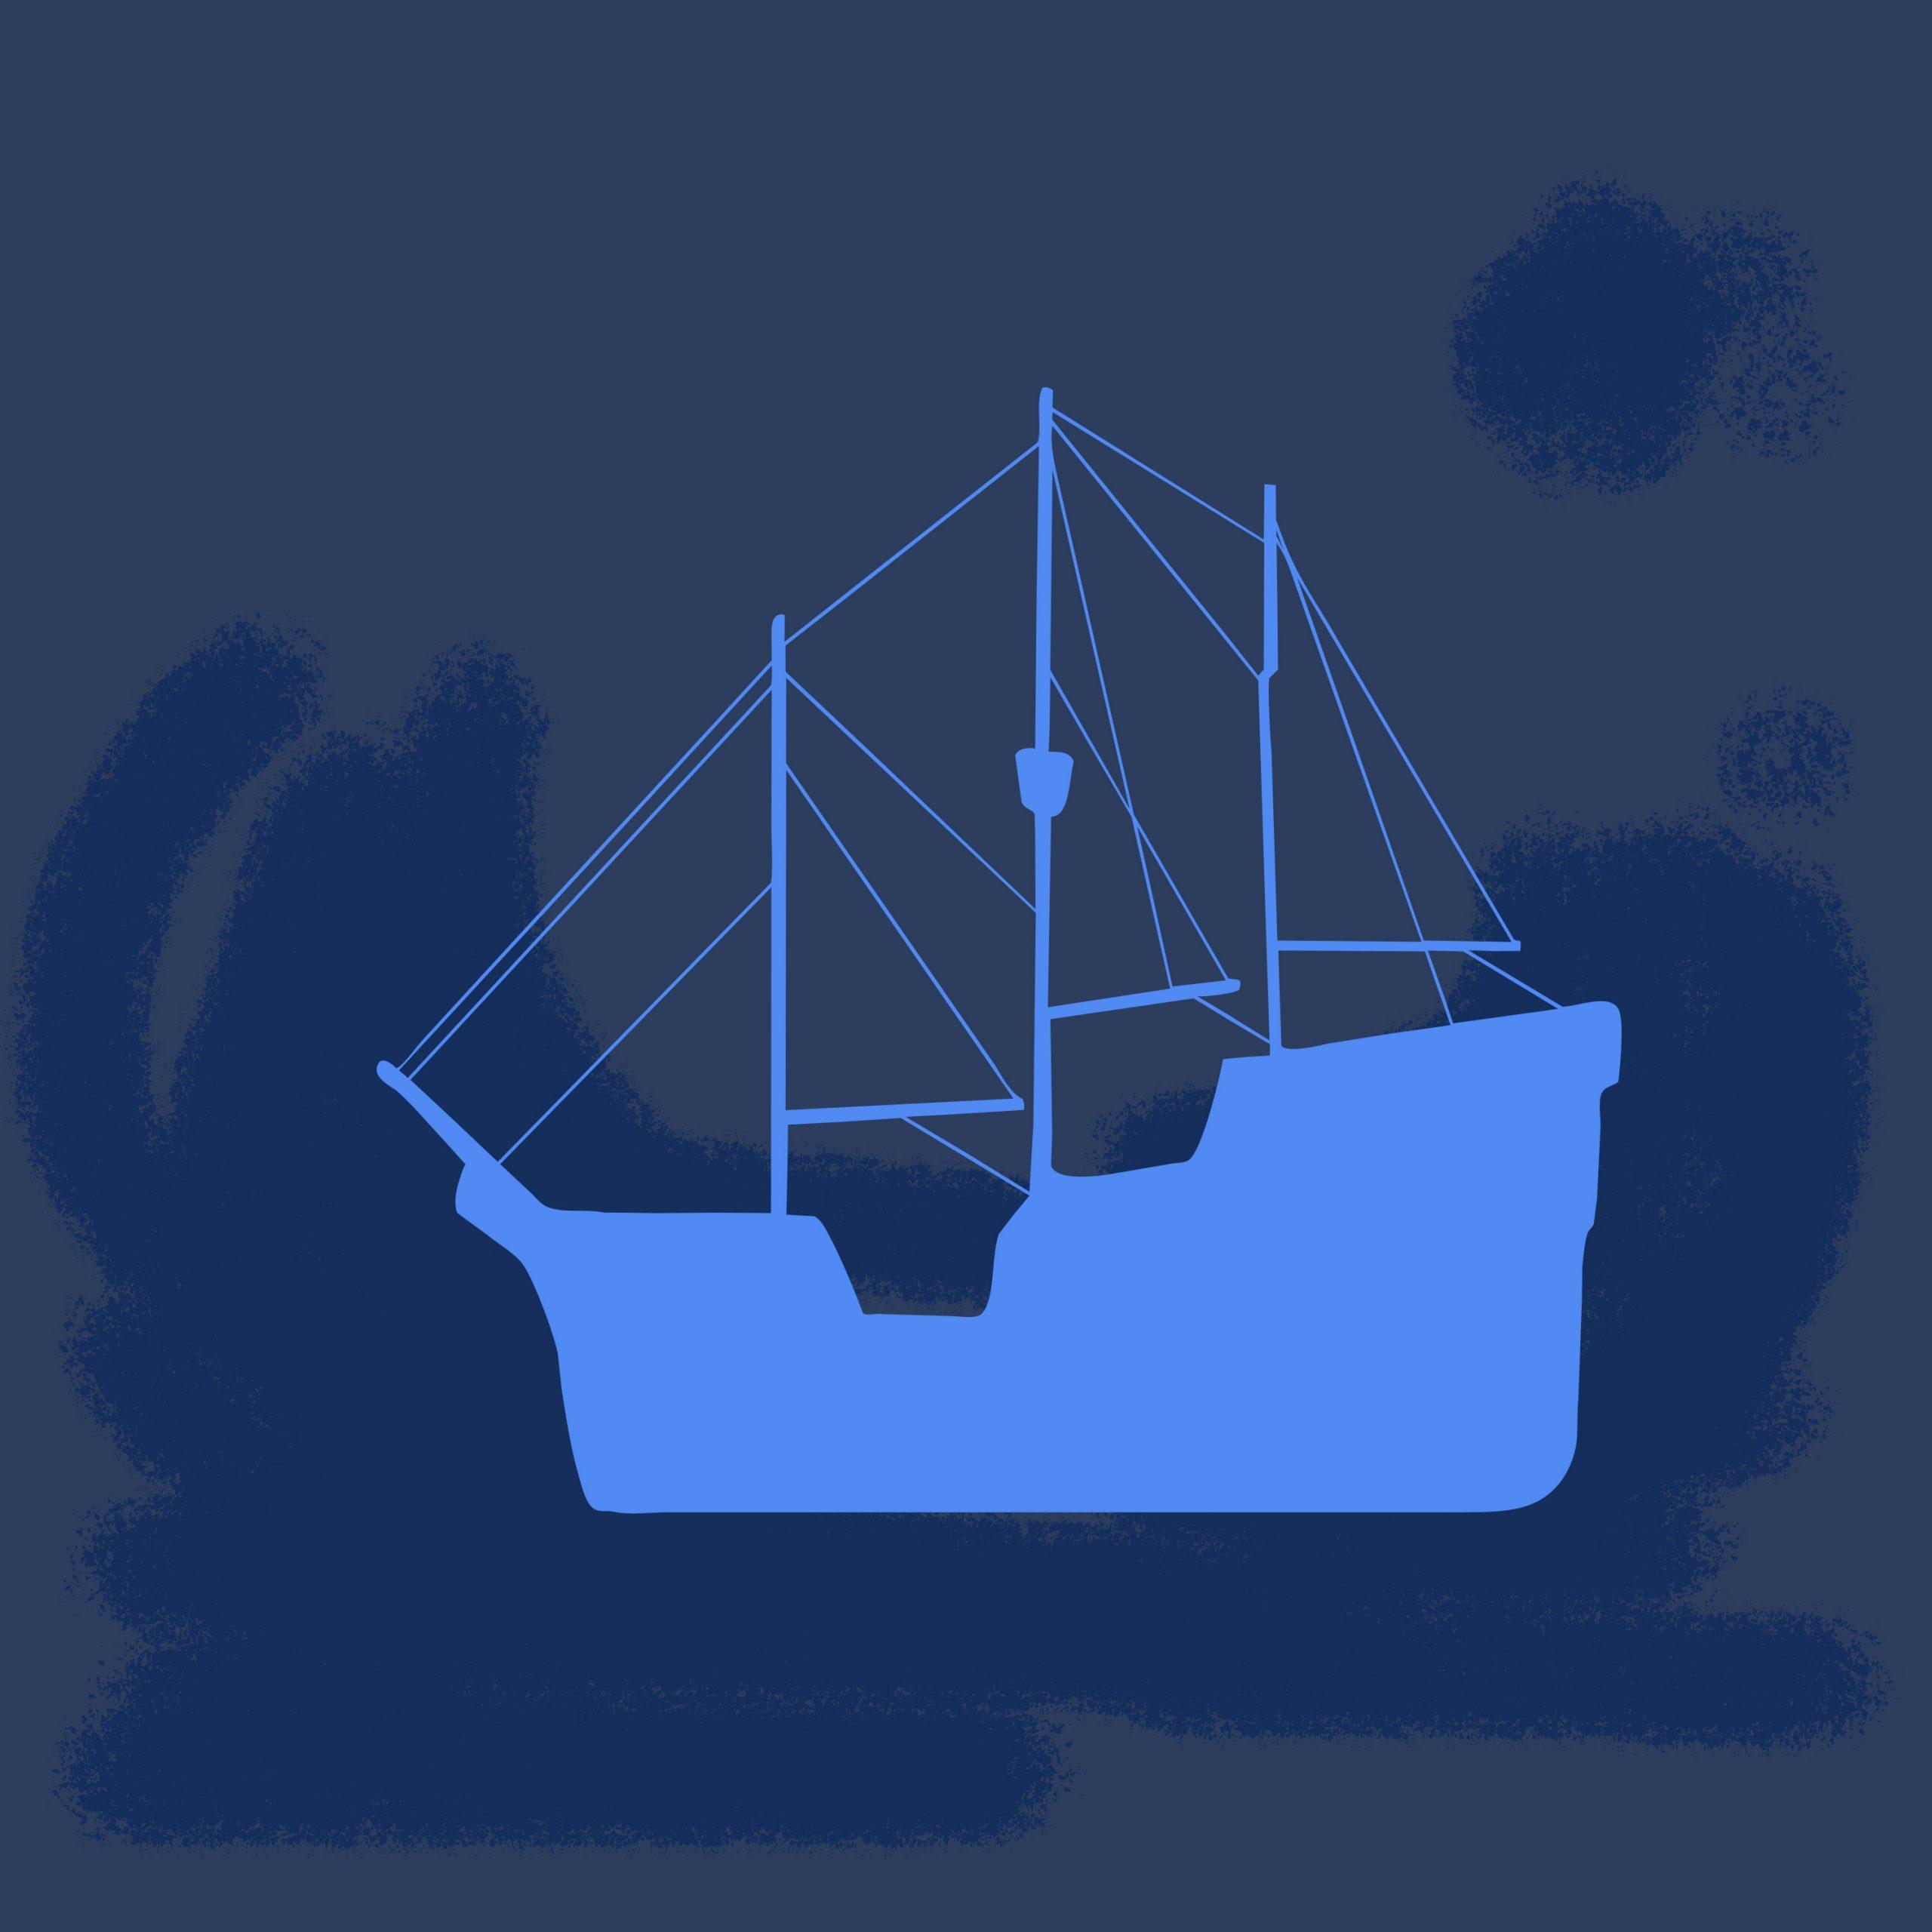 Boat illustration